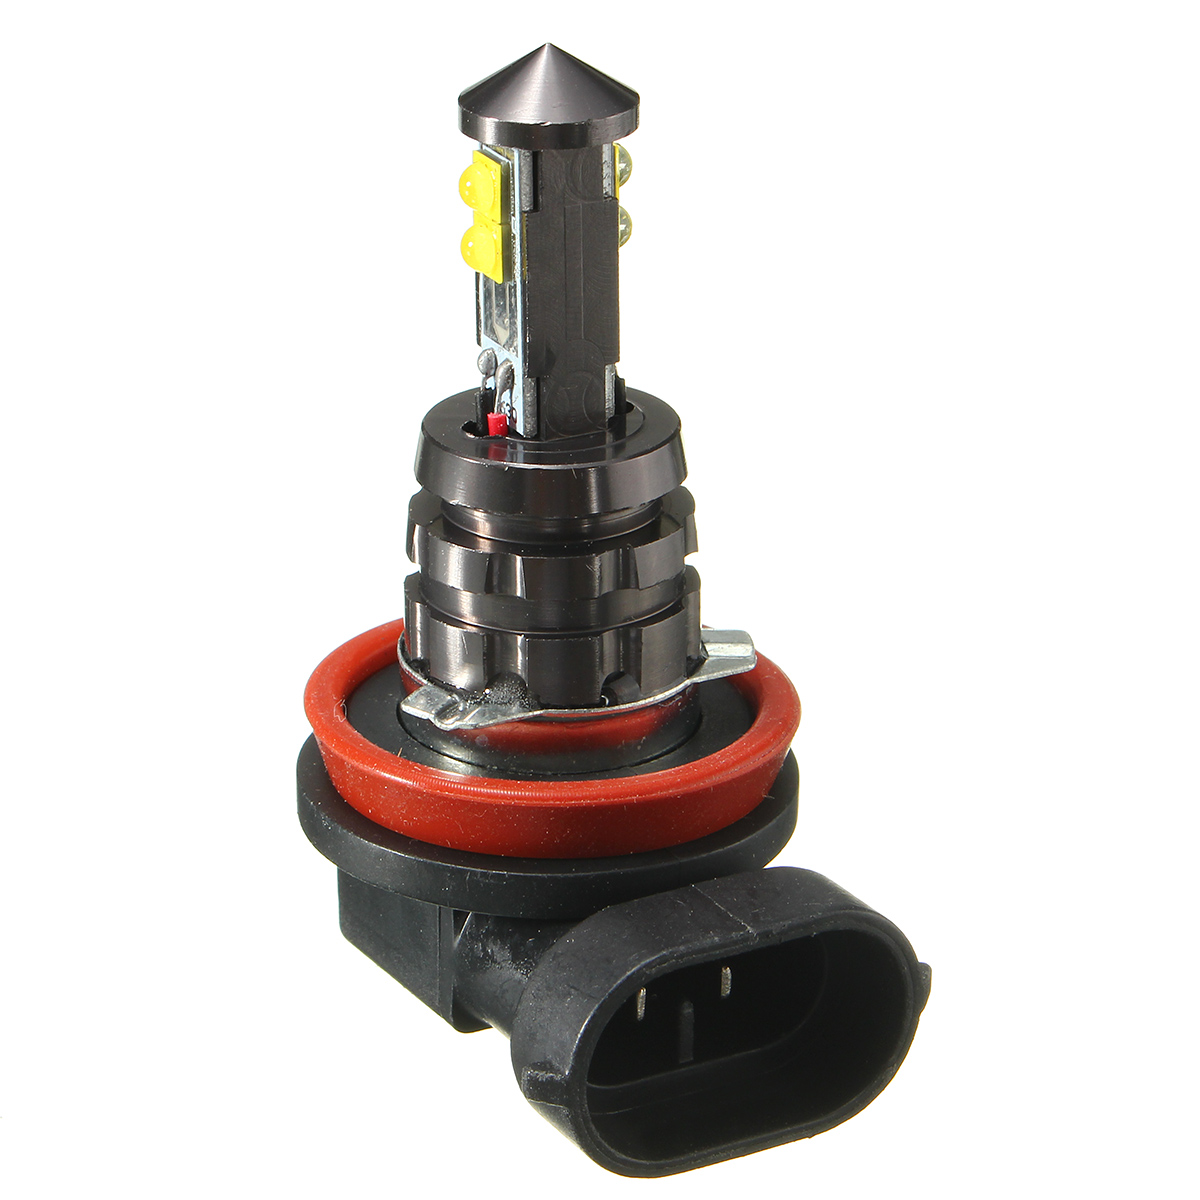 10W 6000K LED Fog Light H4 H7 H11 9006/HB4 9005/HB3 H16 Driving Lamp Bulb White